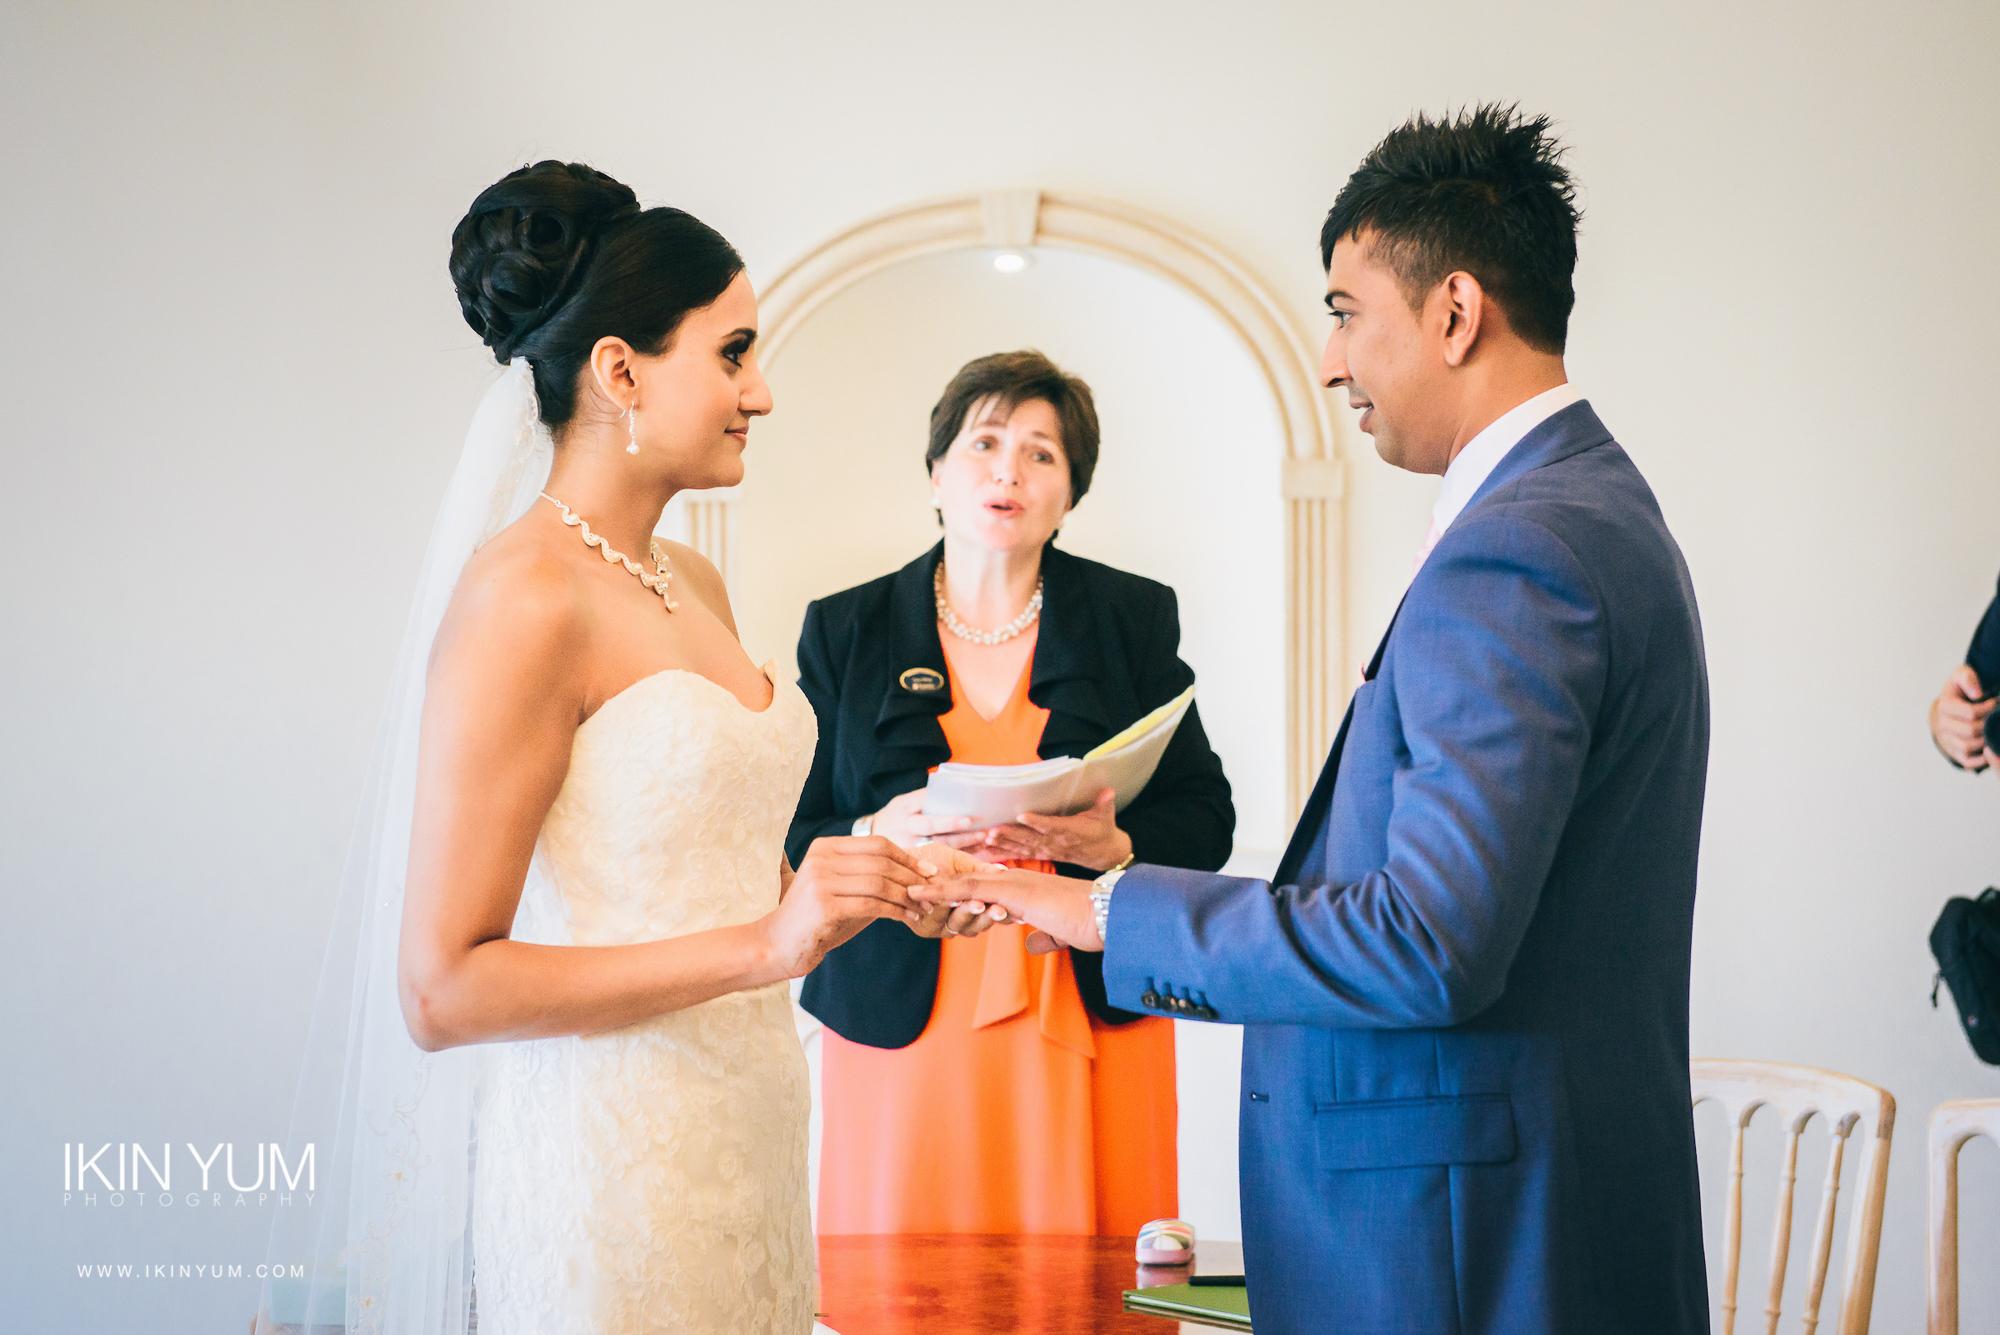 Froyle Park Indian Wedding - Ikin Yum Photography-058.jpg